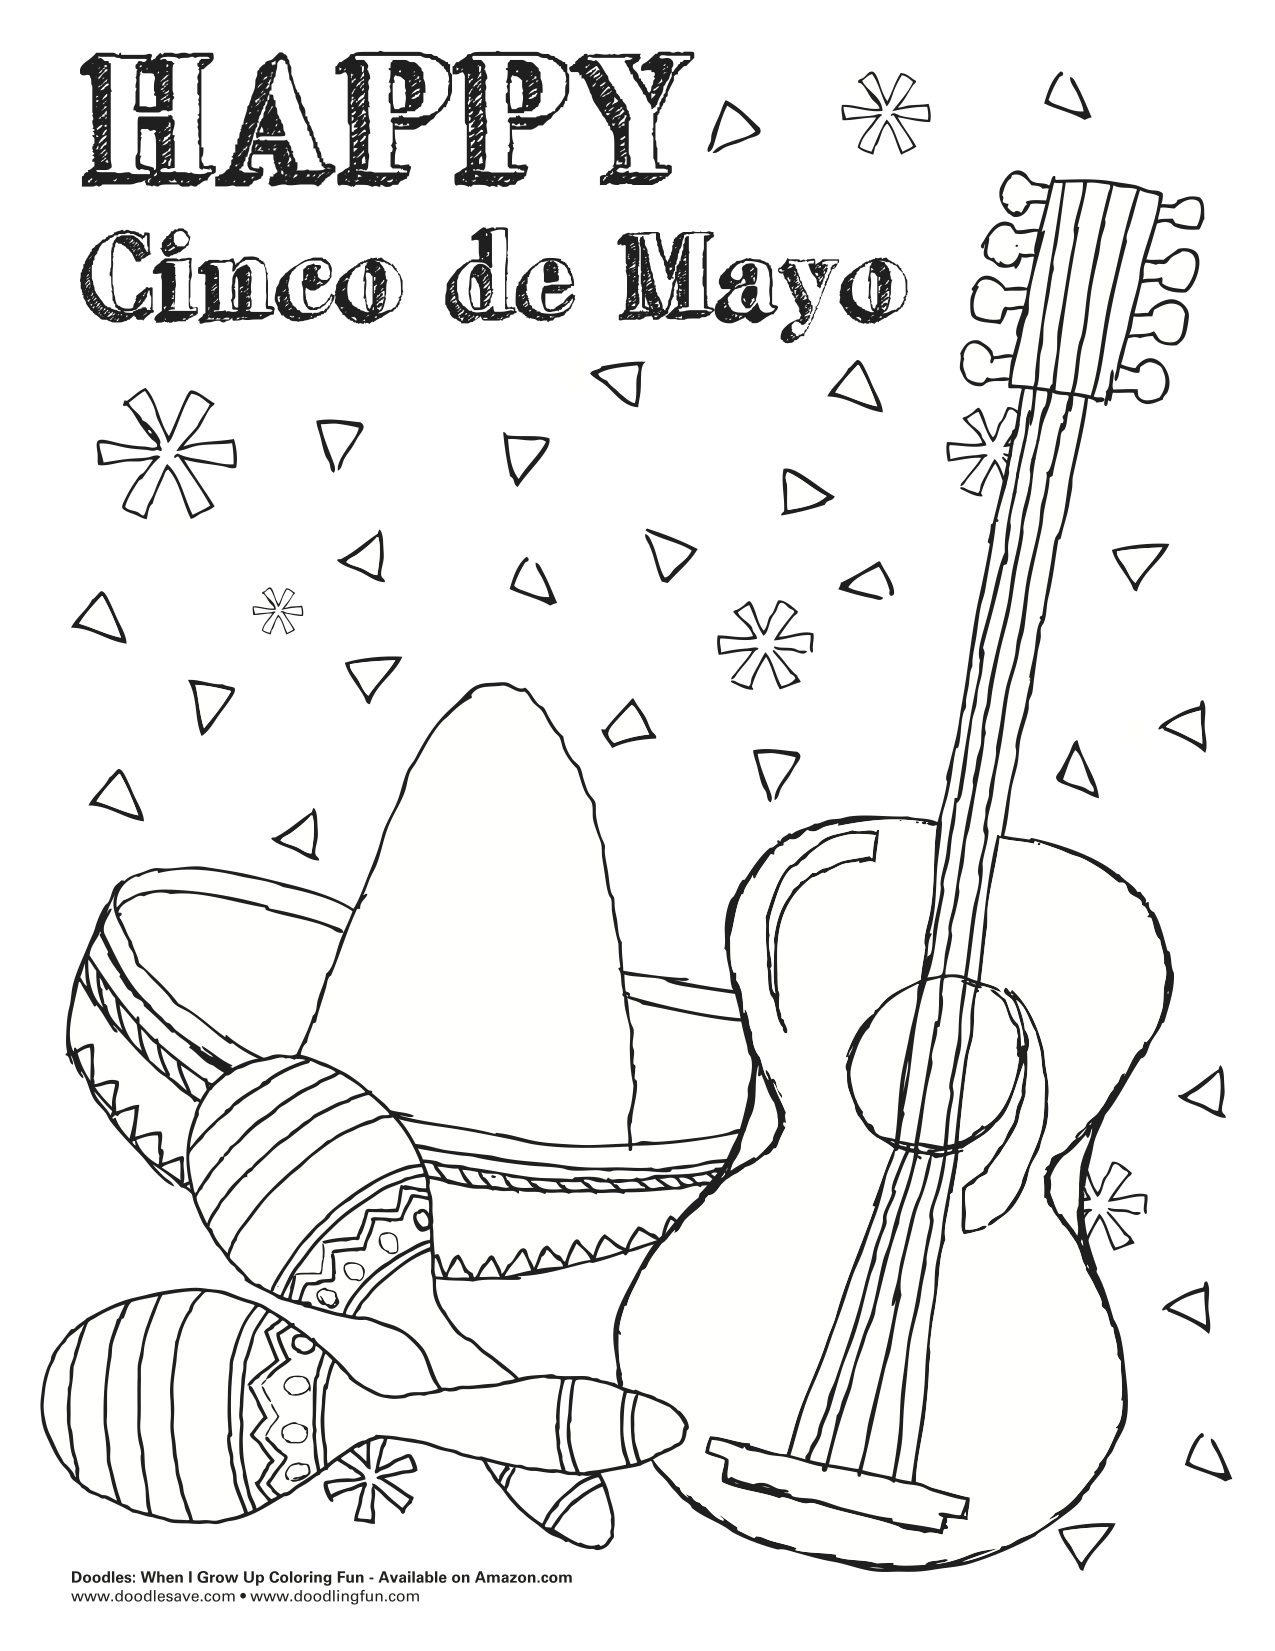 Cinco de mayo coloring pages to